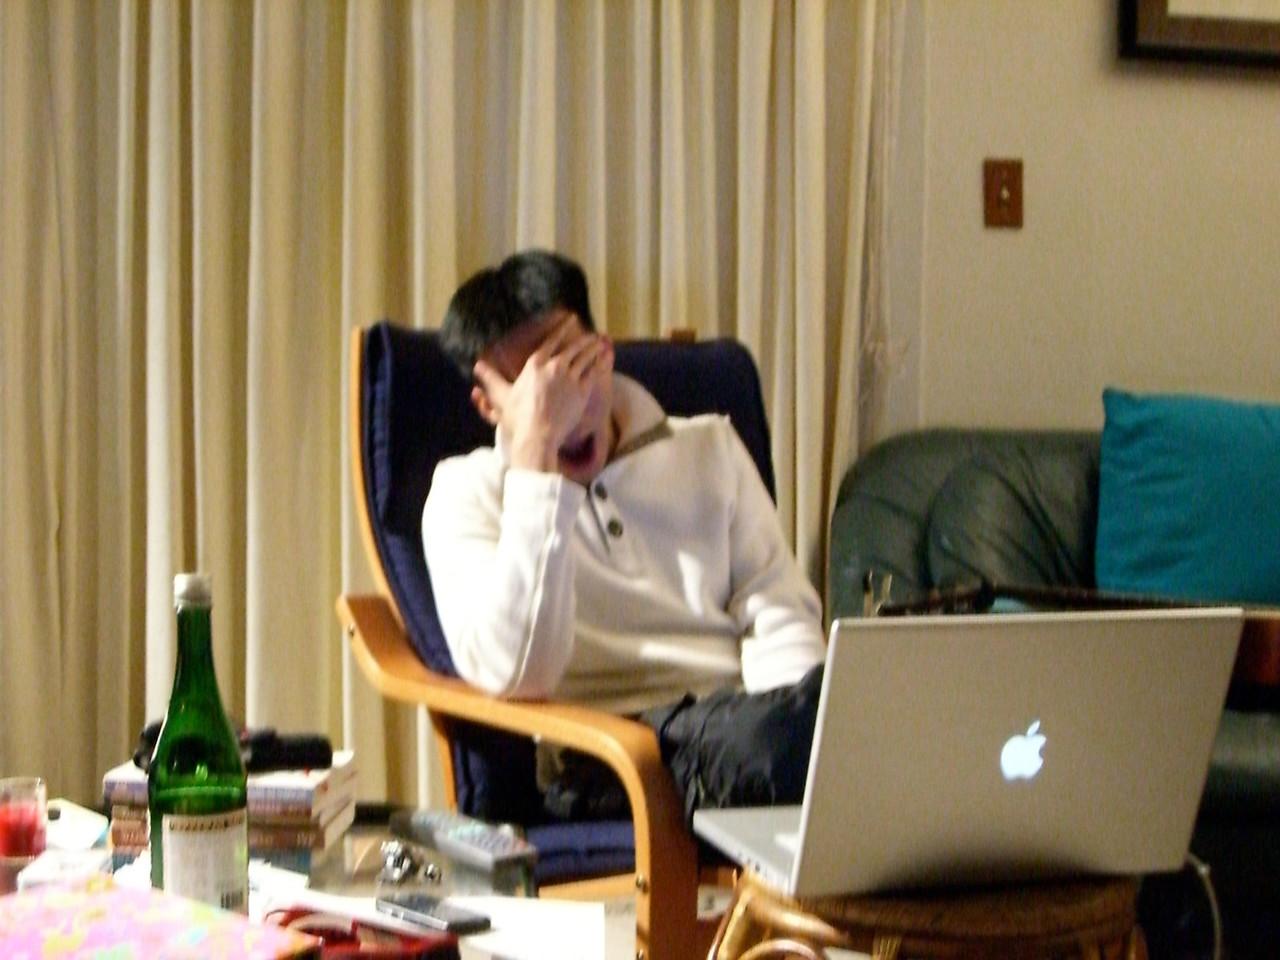 2006 03 24 Fri - Jenny Alyono & Pablo Pozo's pity visit - Ben Yu losing the battle with sleep